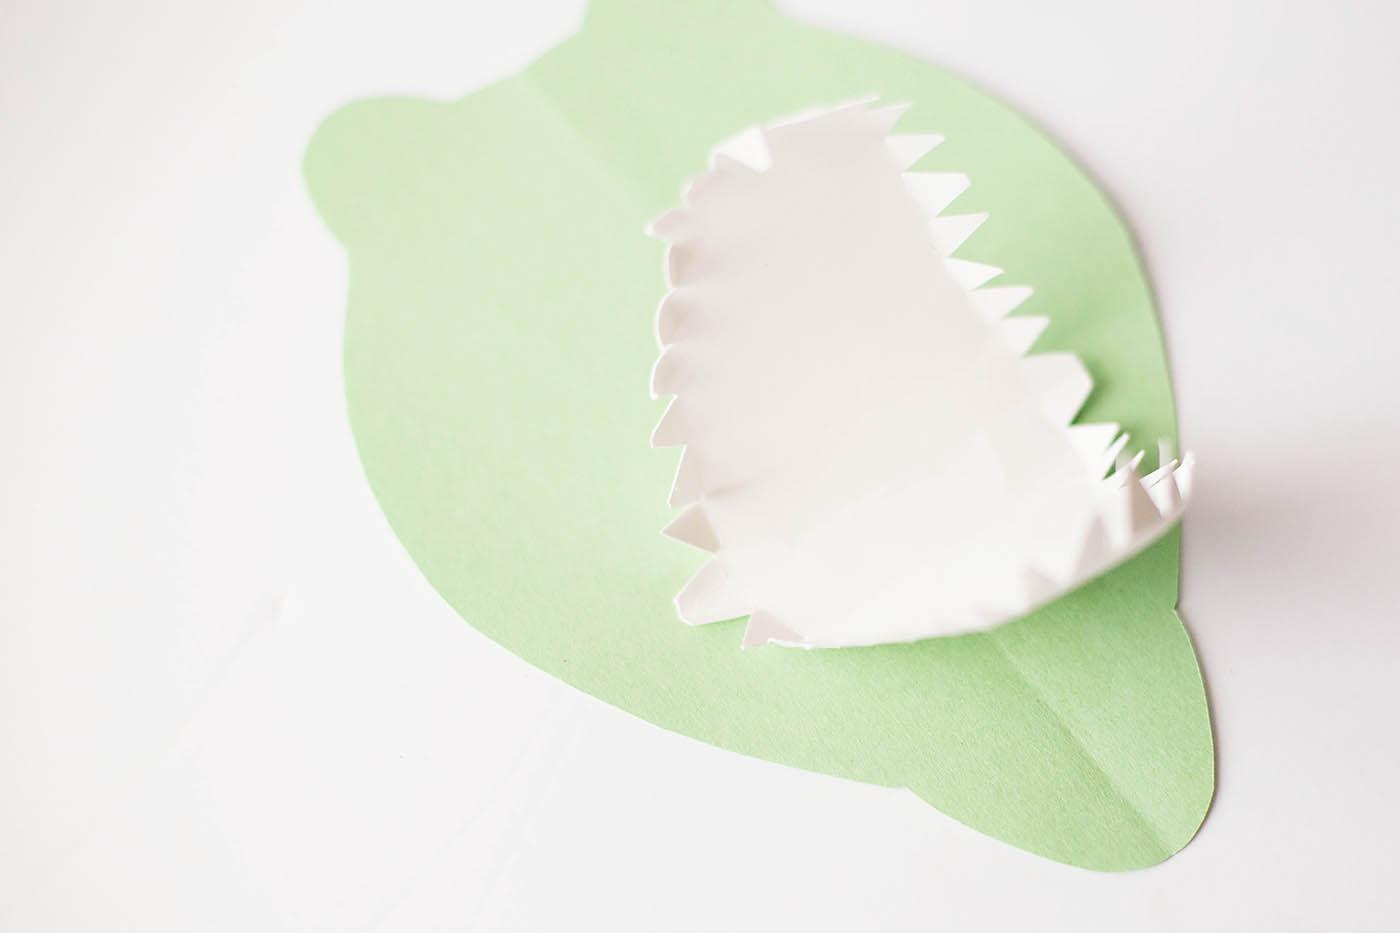 T-Rex dinosar jaws craft from allfortheboys.com at Eighteen 25